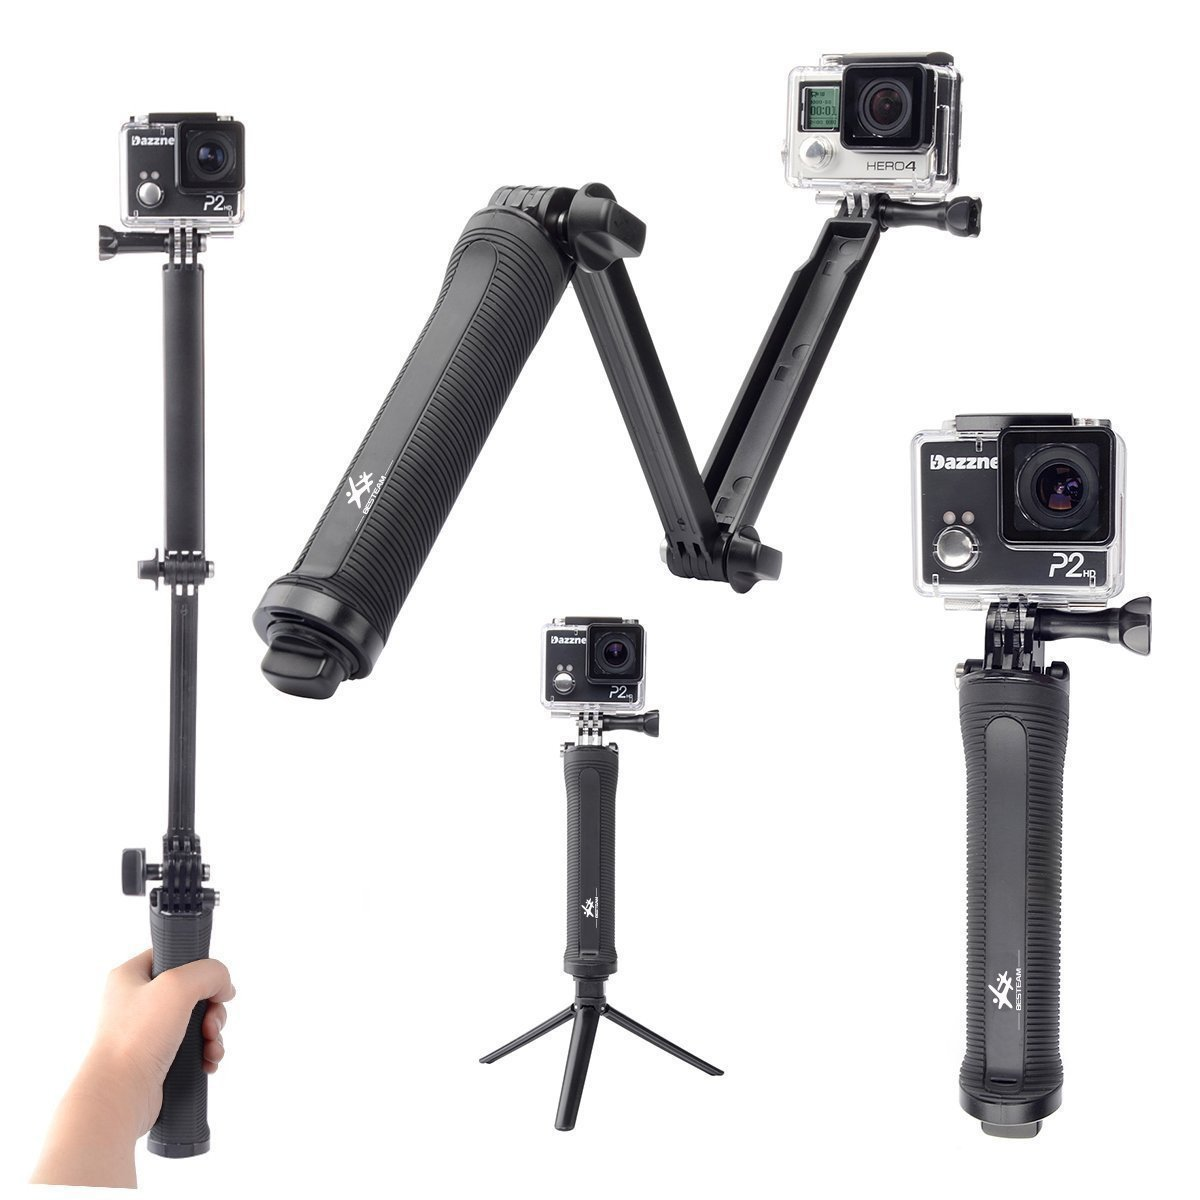 BESTEAM 3-way Grip Arm Tripod Handle Bracket Stabilizer for GoPro Hero 4 3+ 3